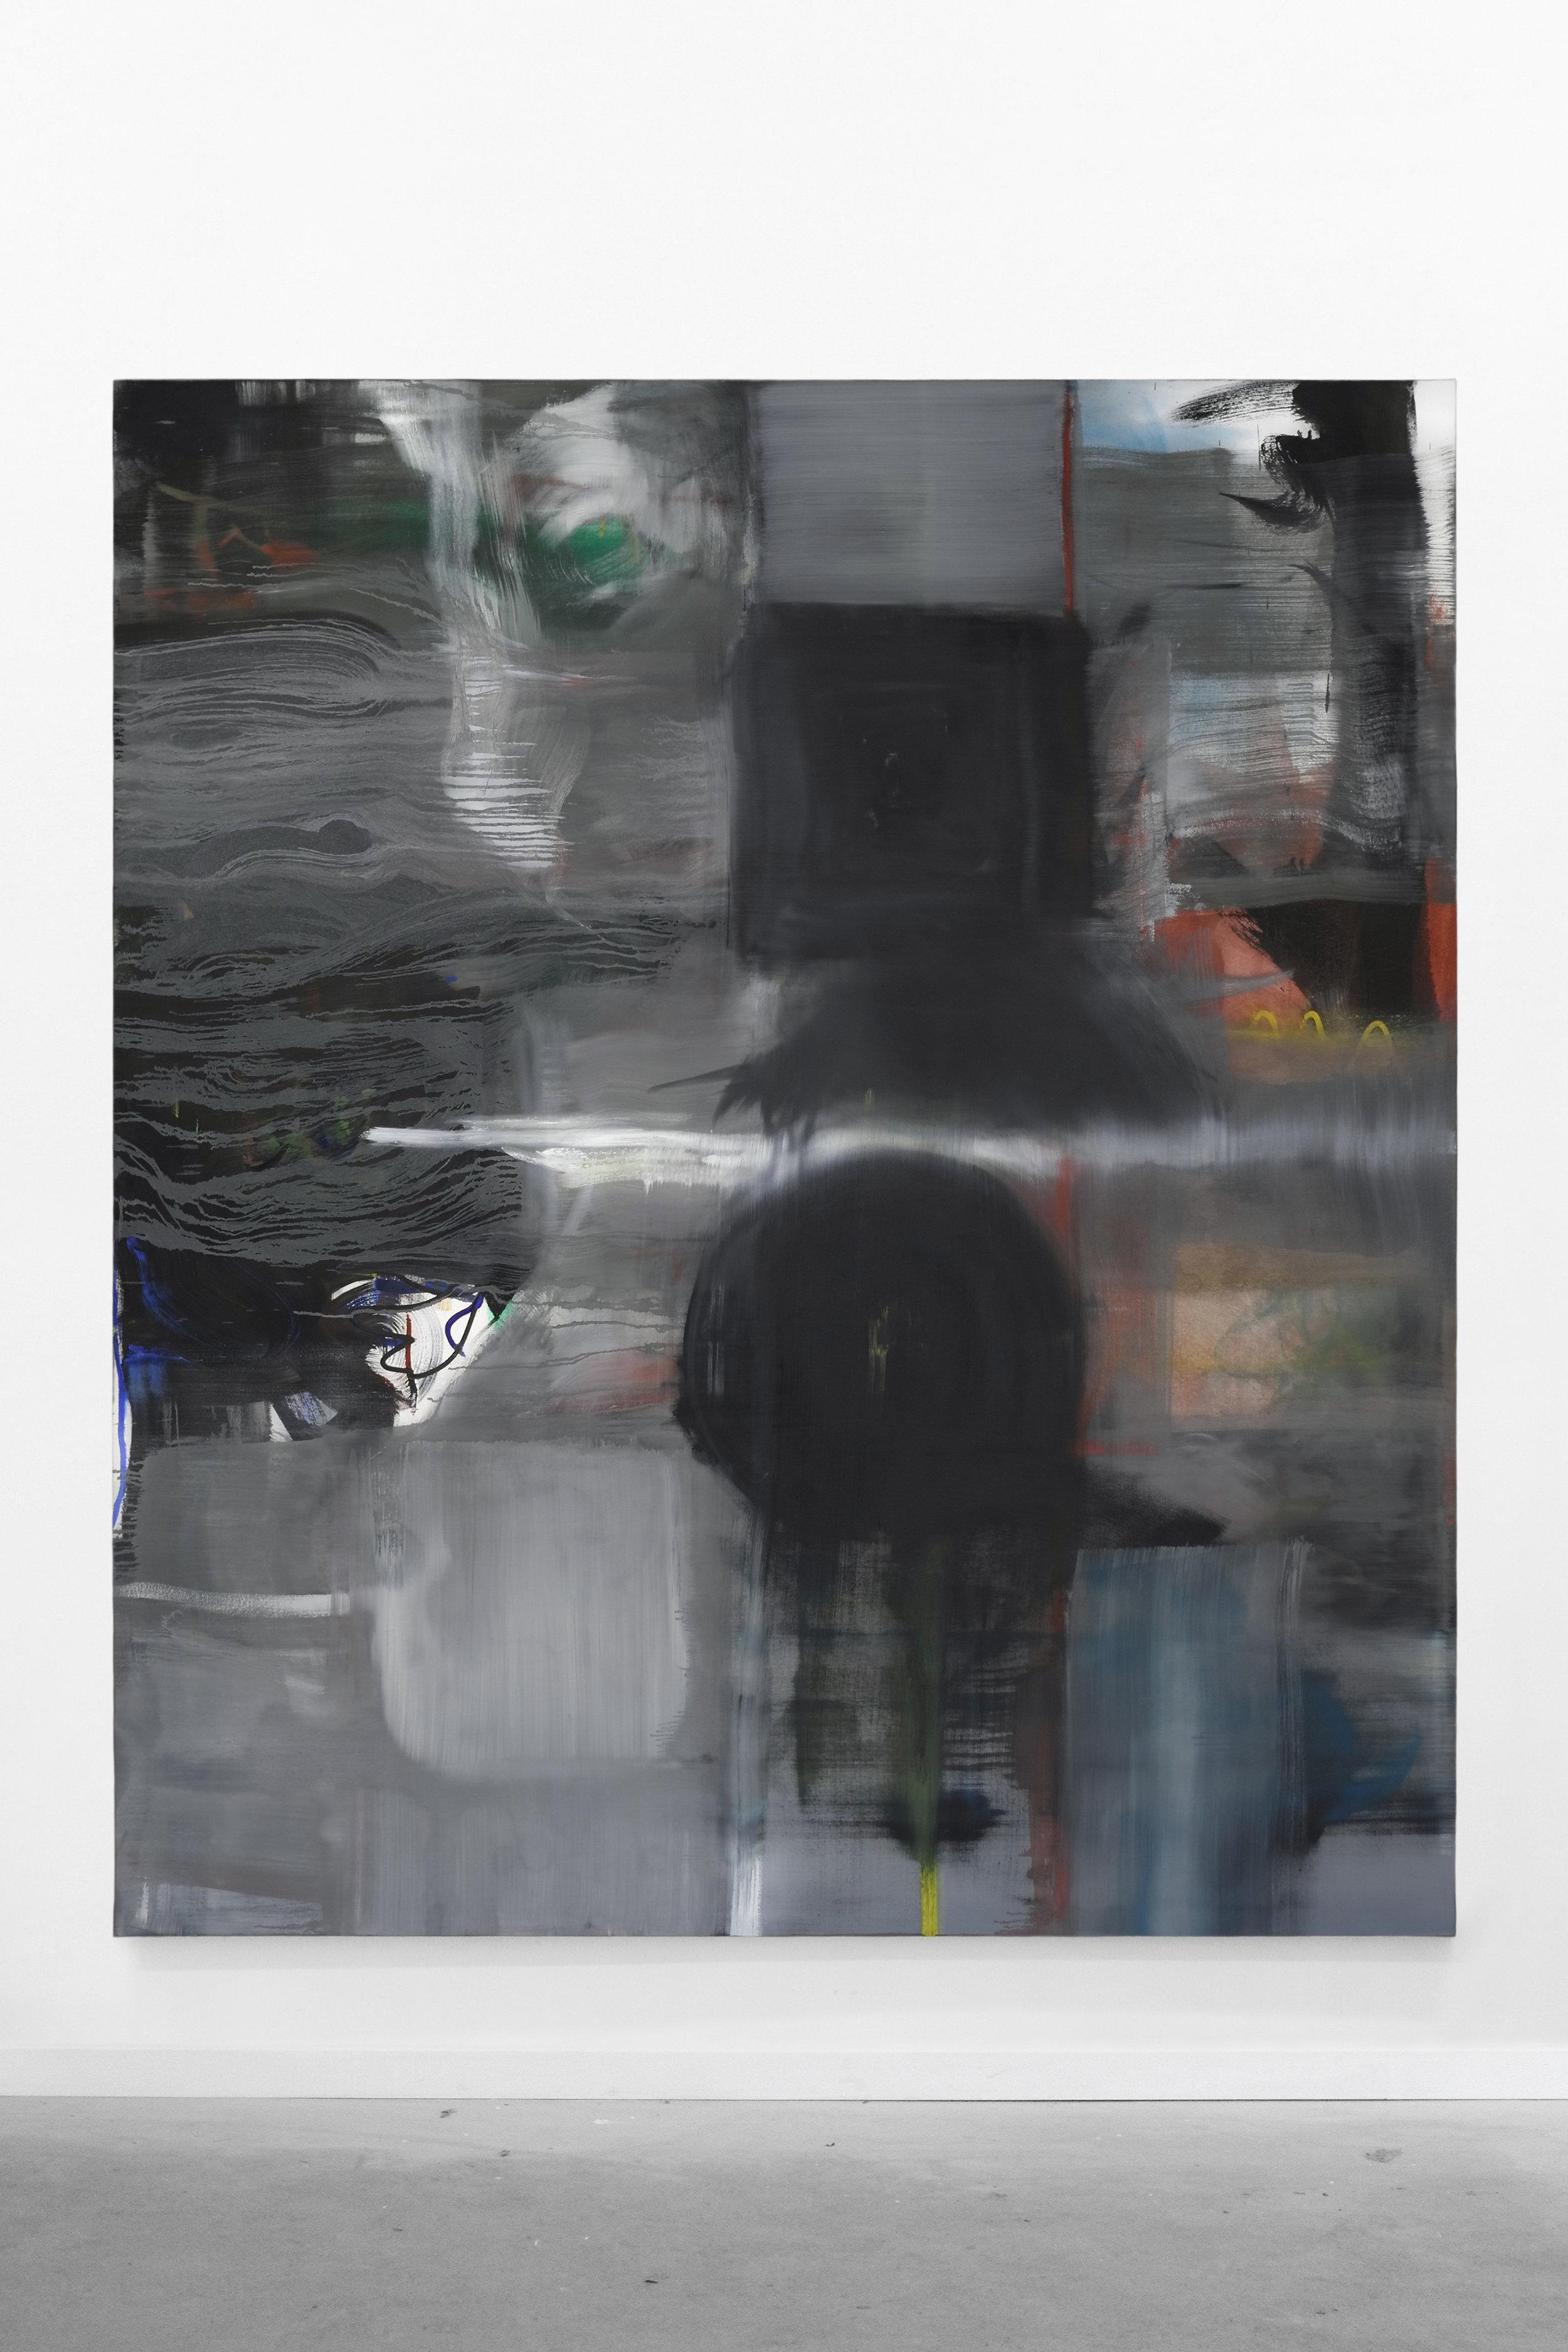 S. Derviz, Untitled, oil on canvas, 220x190 cm, 2018